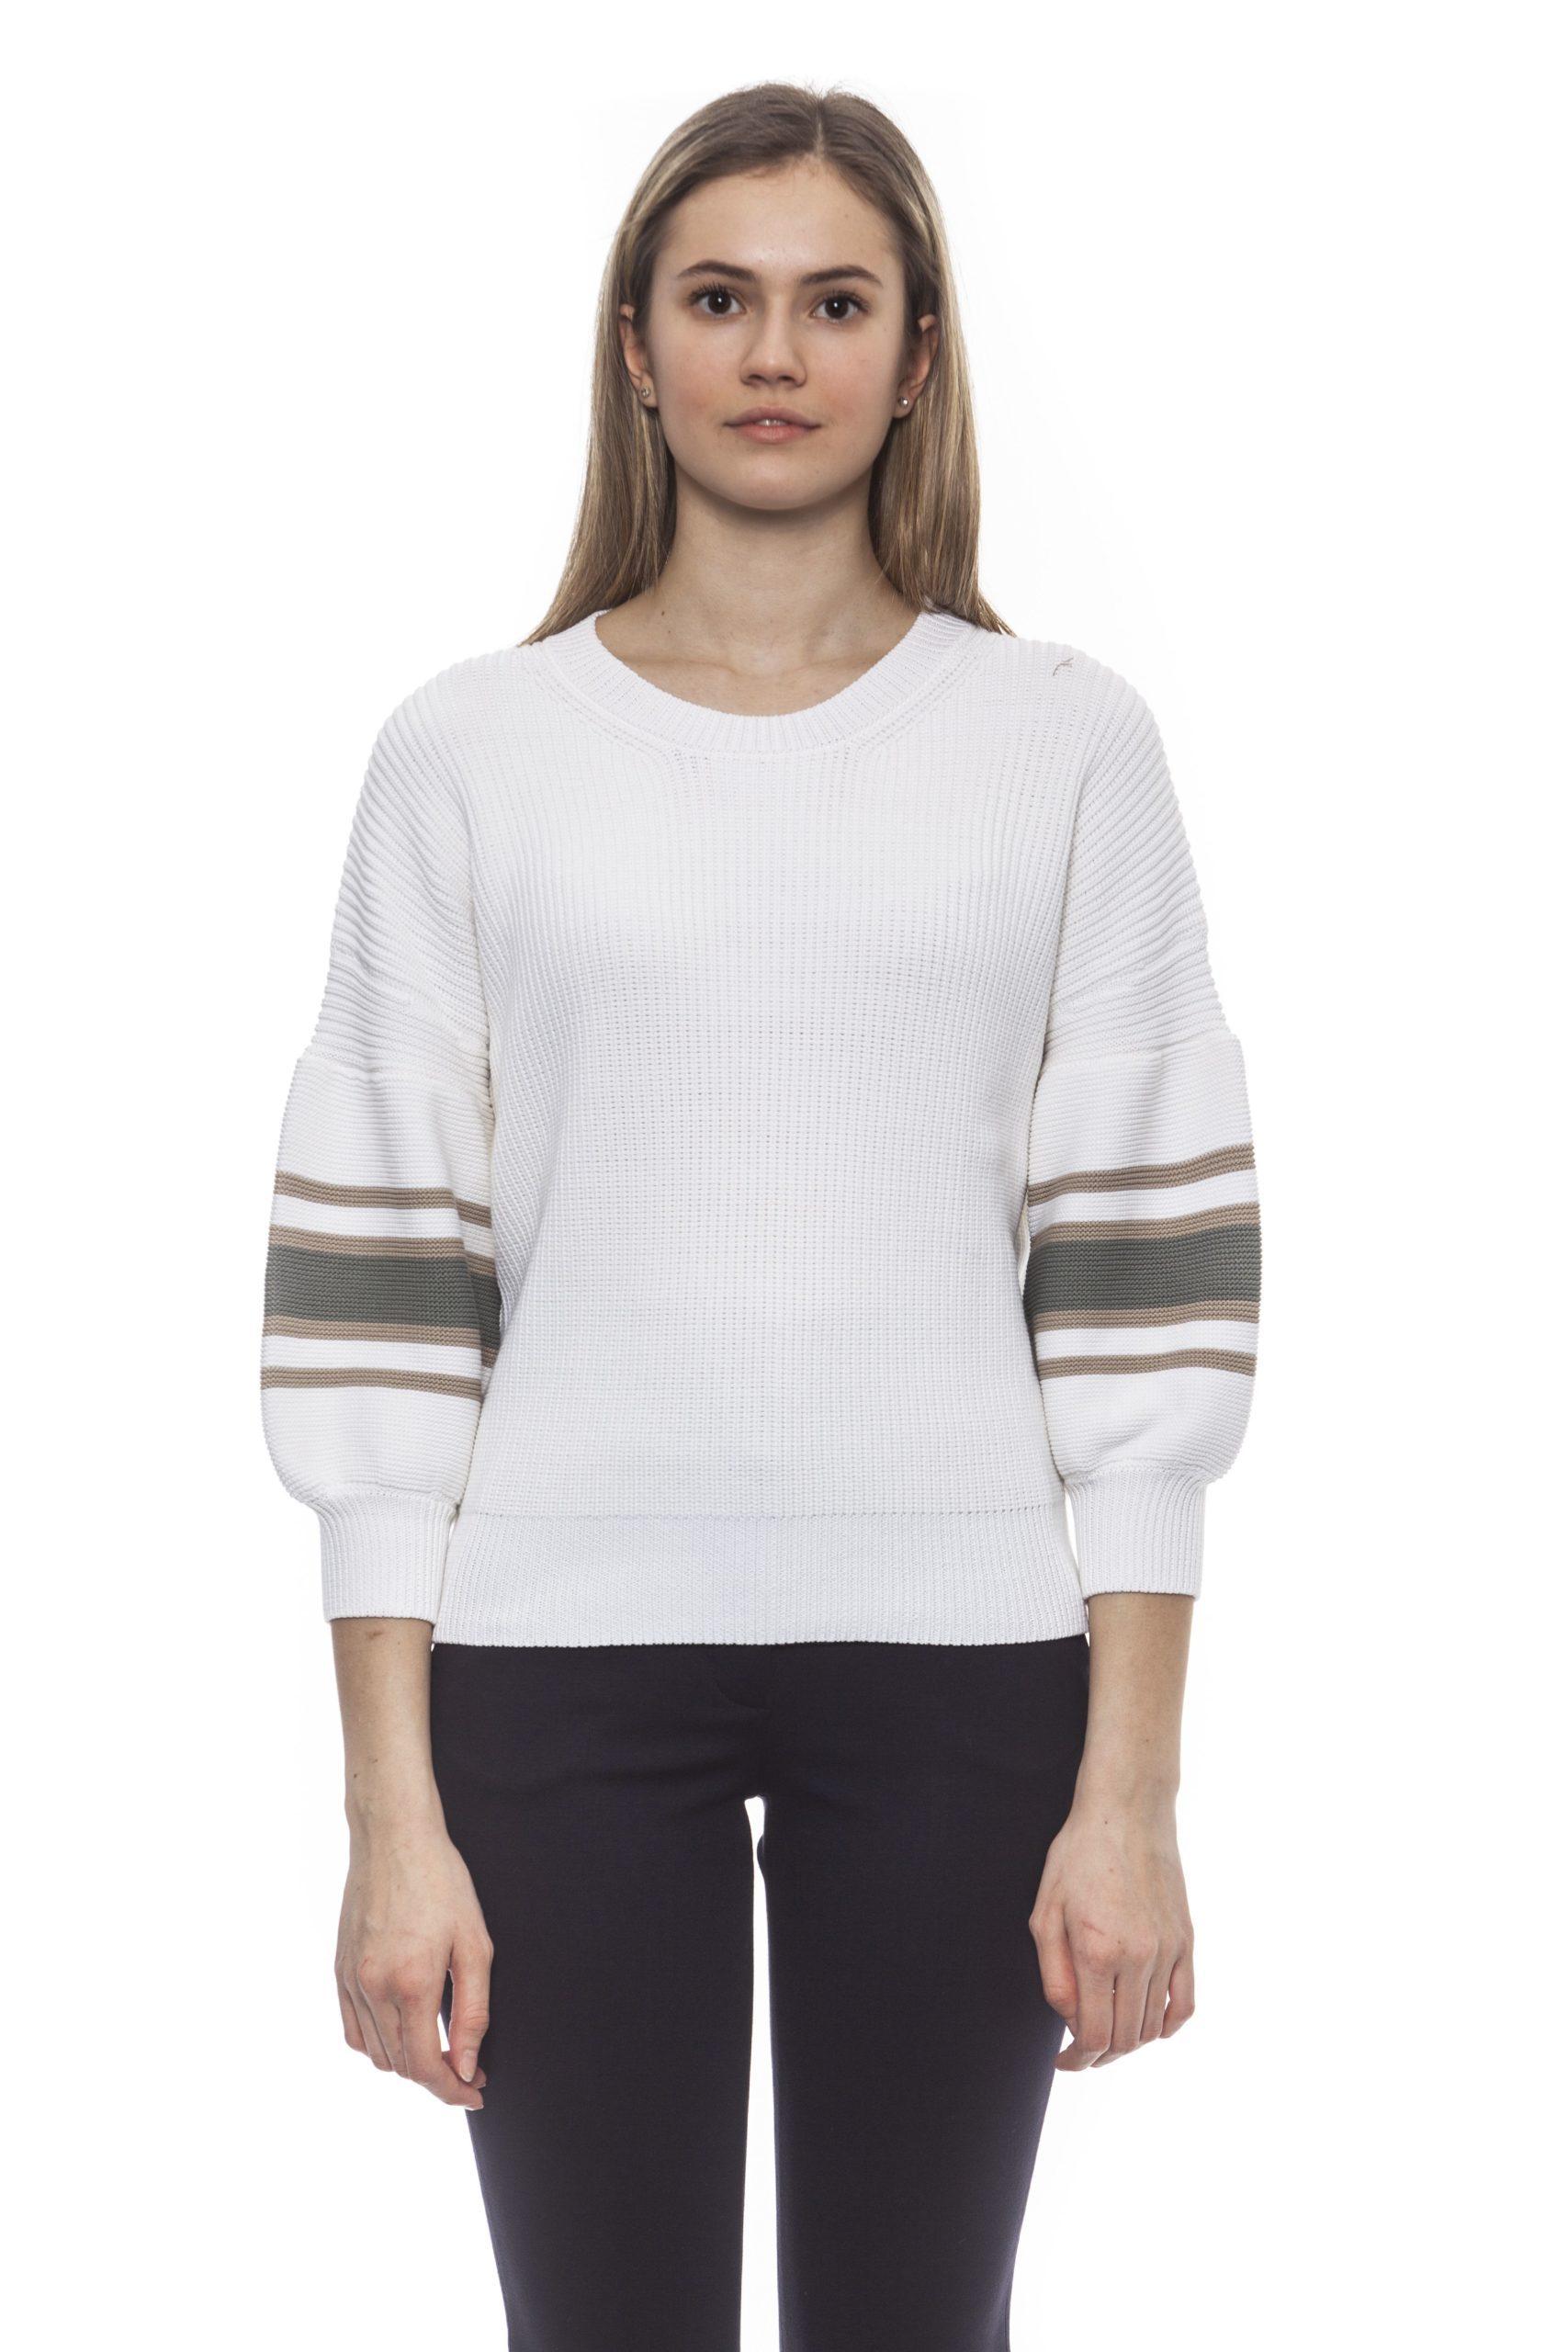 Peserico Women's Bianco Sweater White PE1383079 - IT42 | S